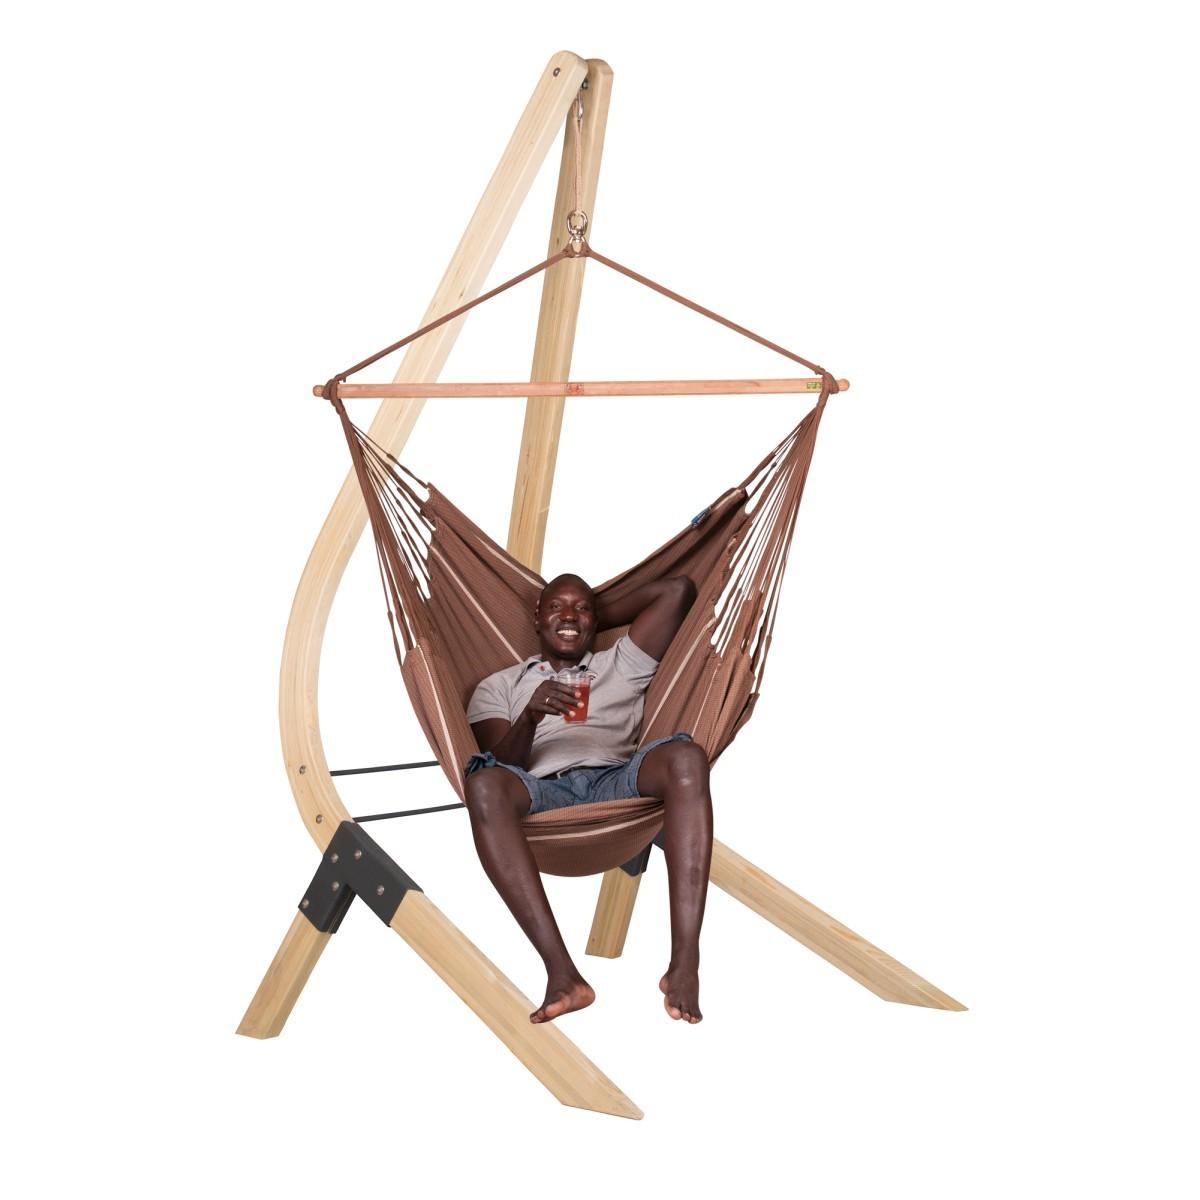 LA SIESTA - Chaise-Hamac Lounger HABANA chocolate + Support en bois VELA